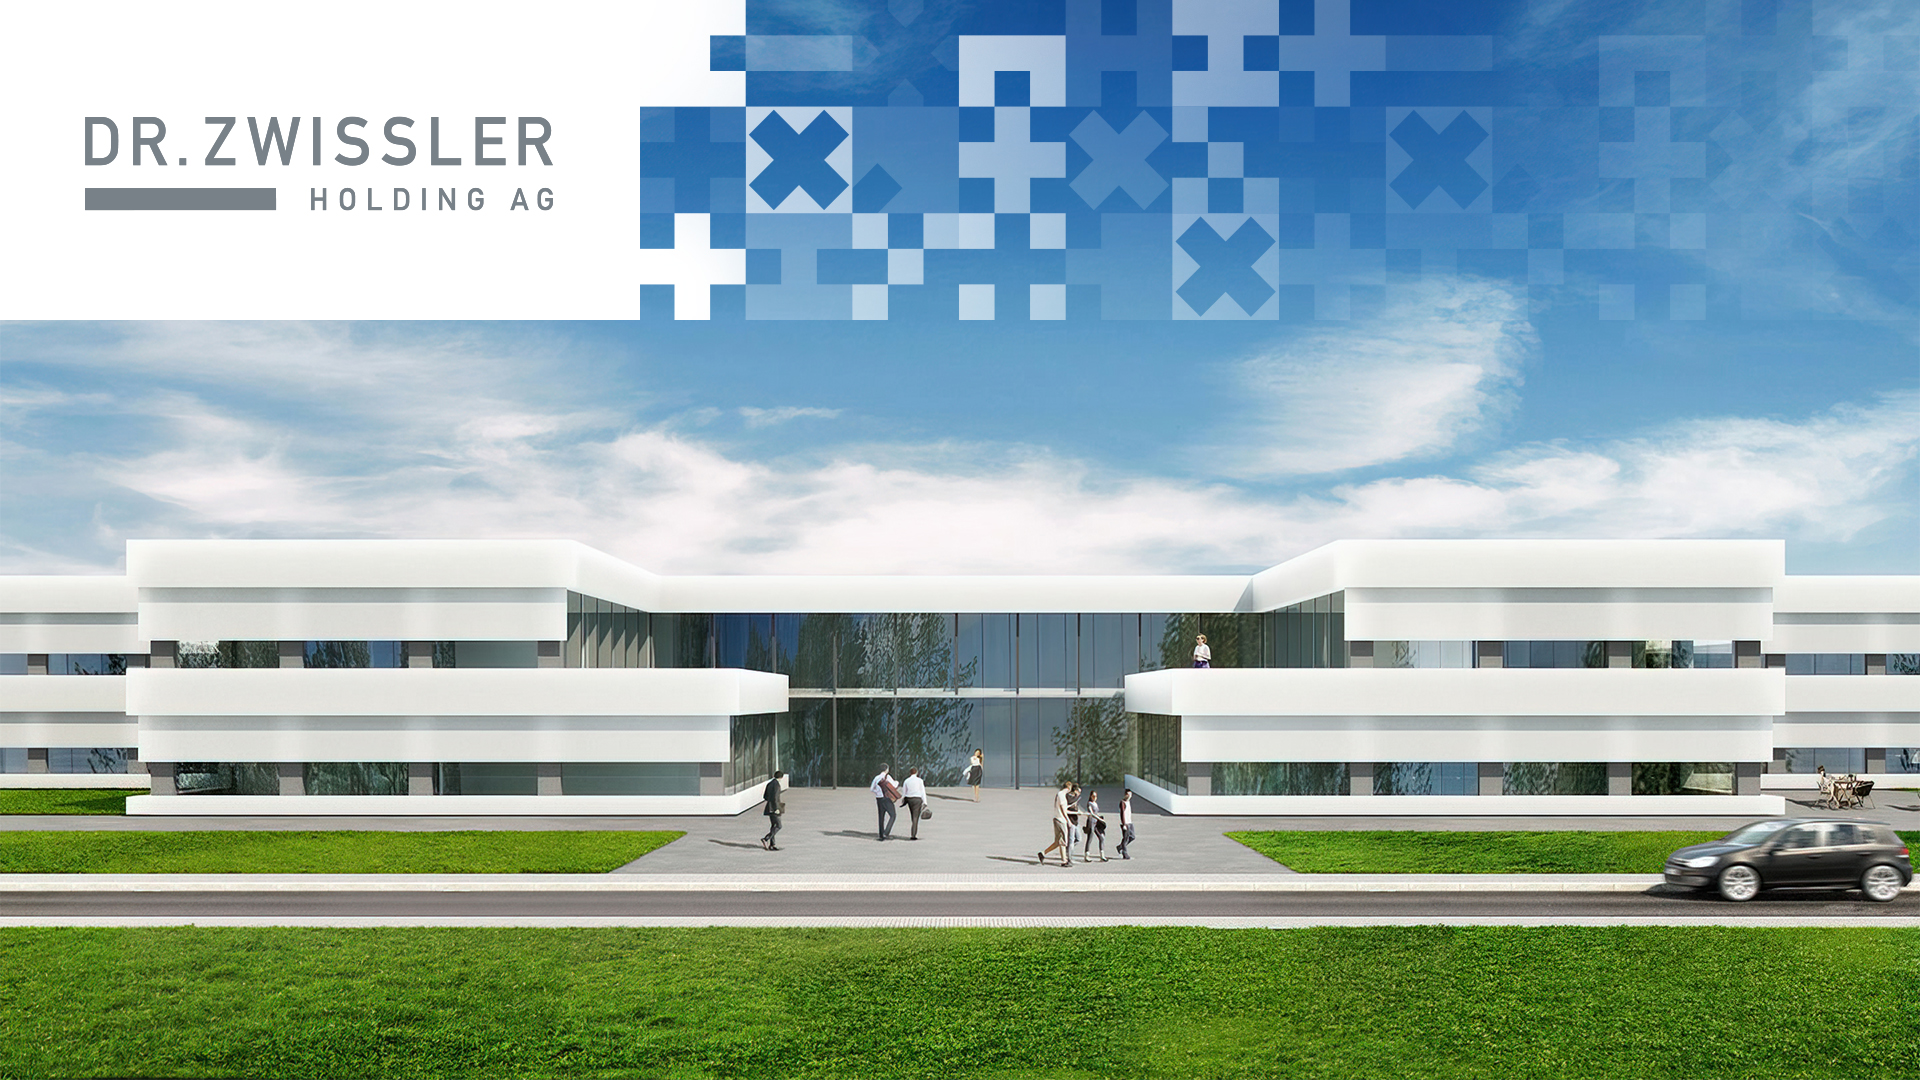 Zentrale Dr. Zwissler Holding AG